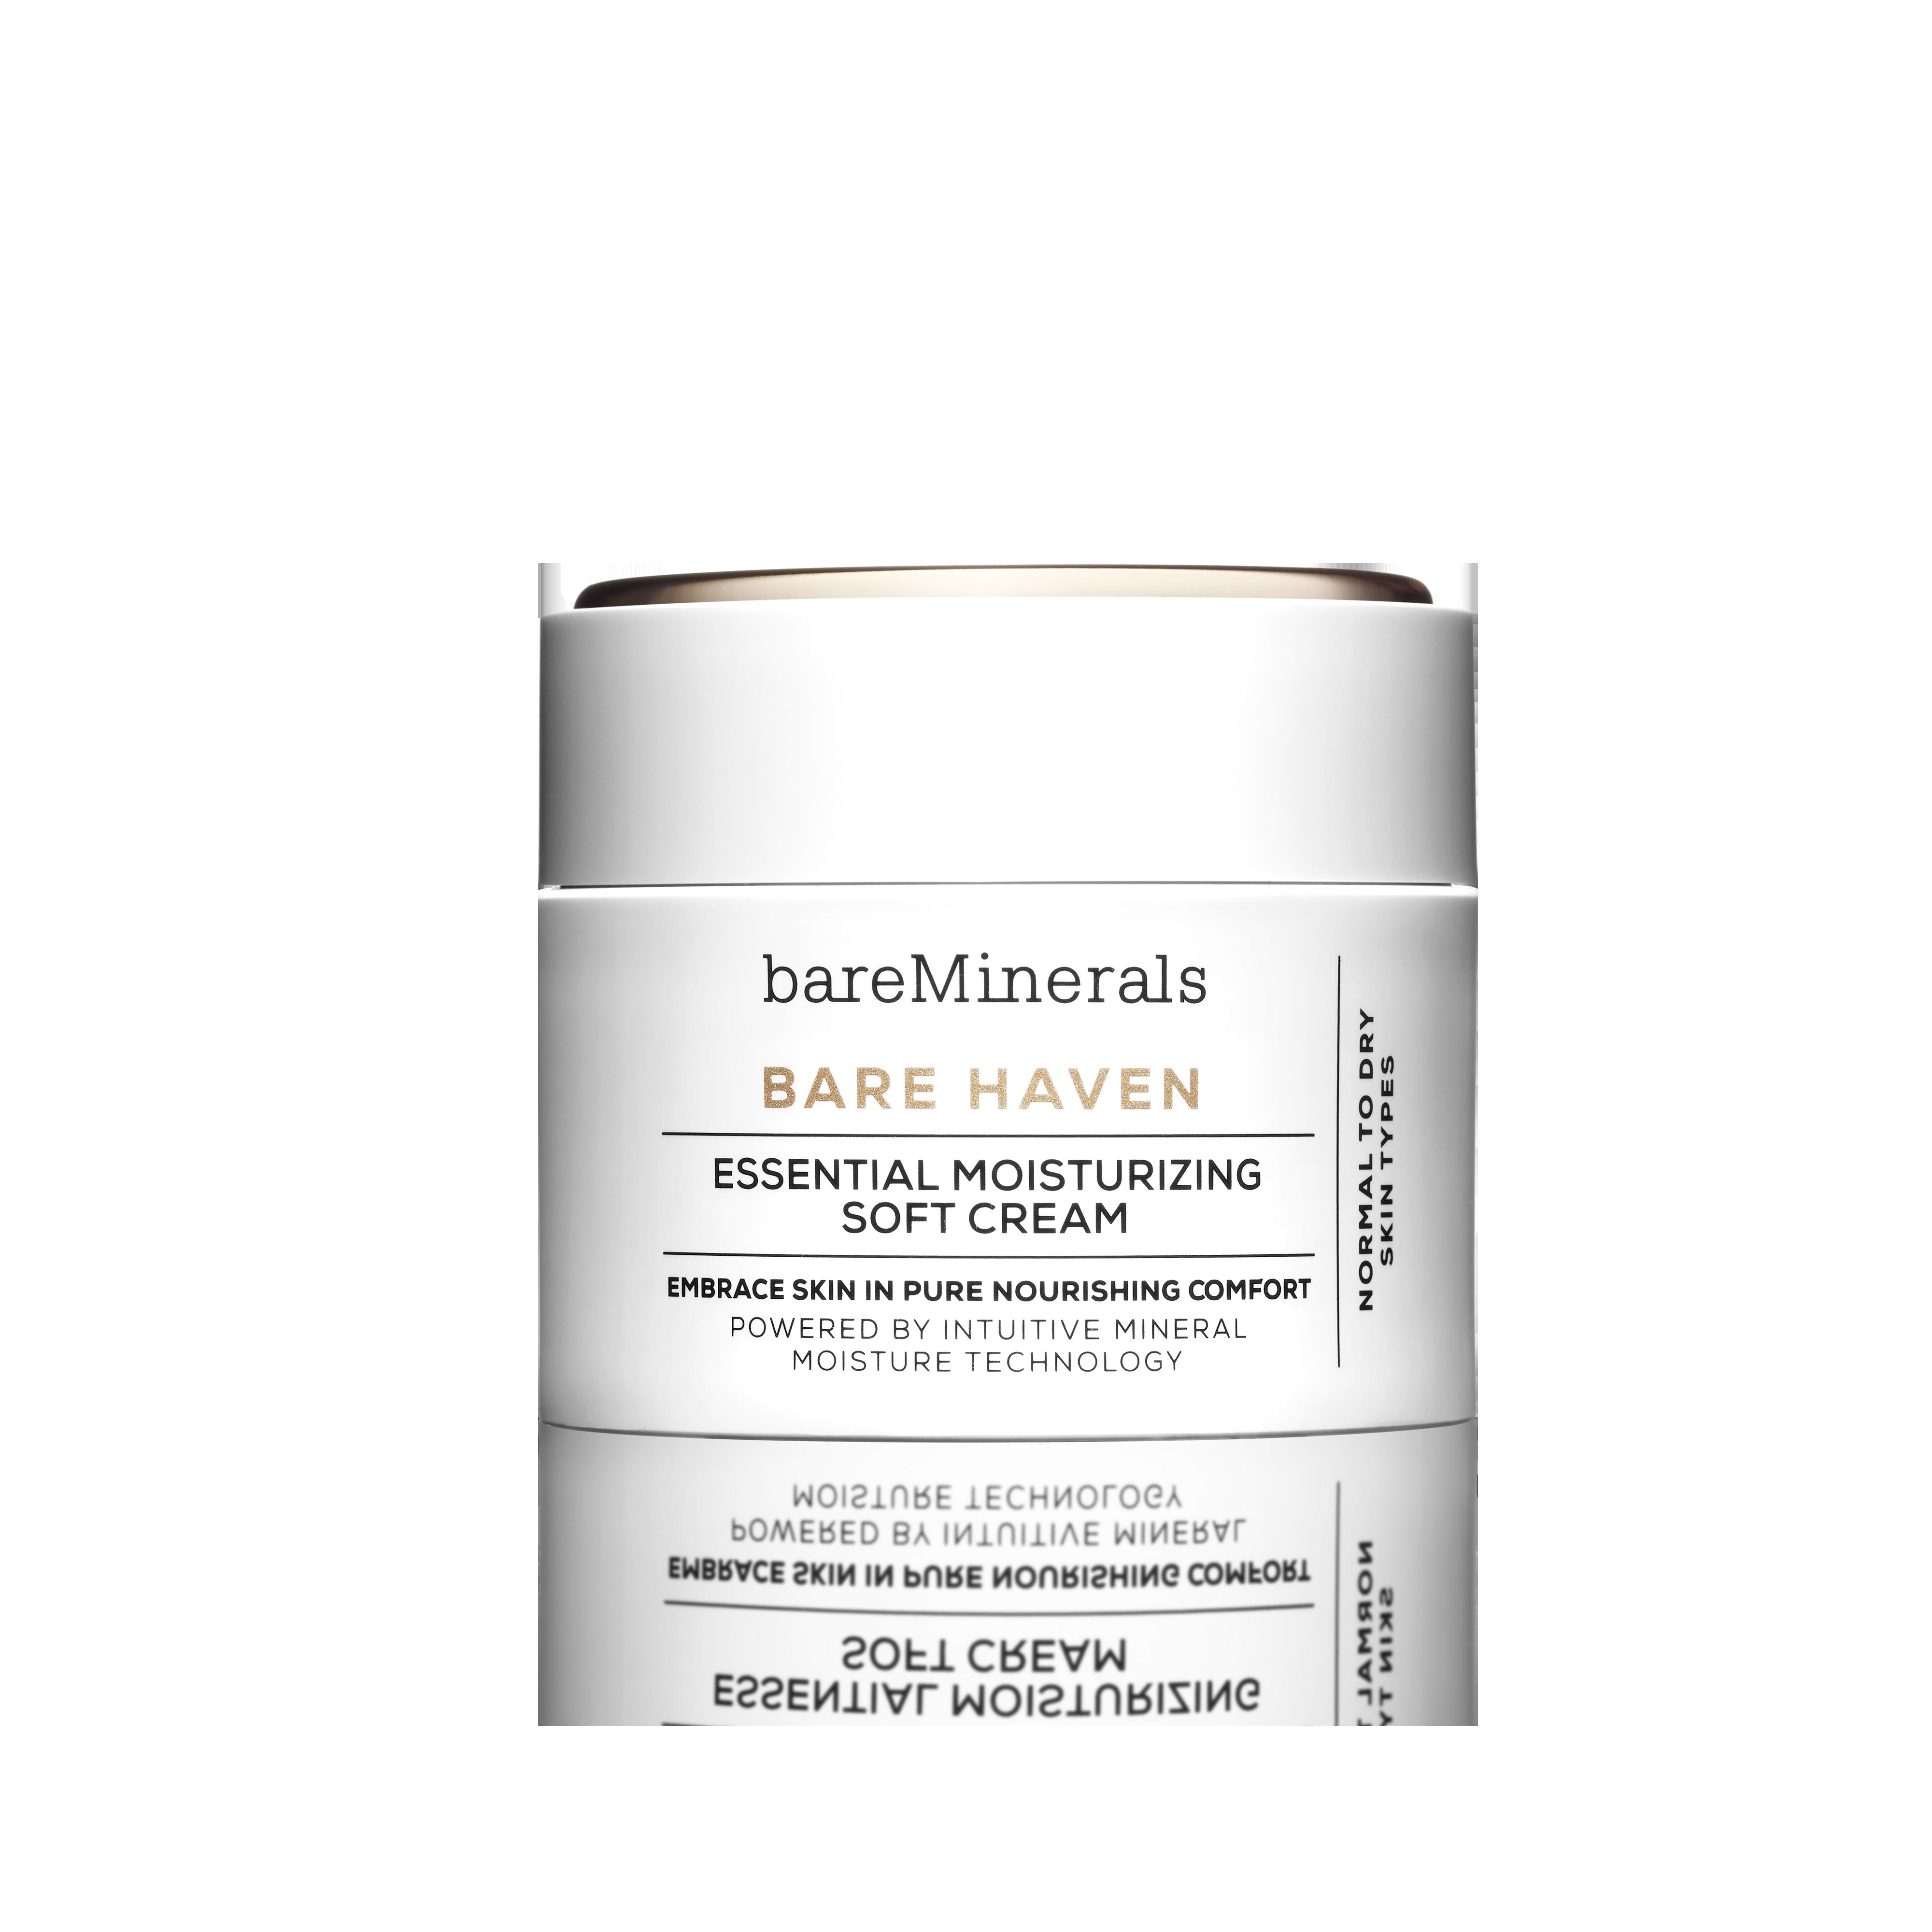 Bare Haven Essential Moisturizing Soft Cream